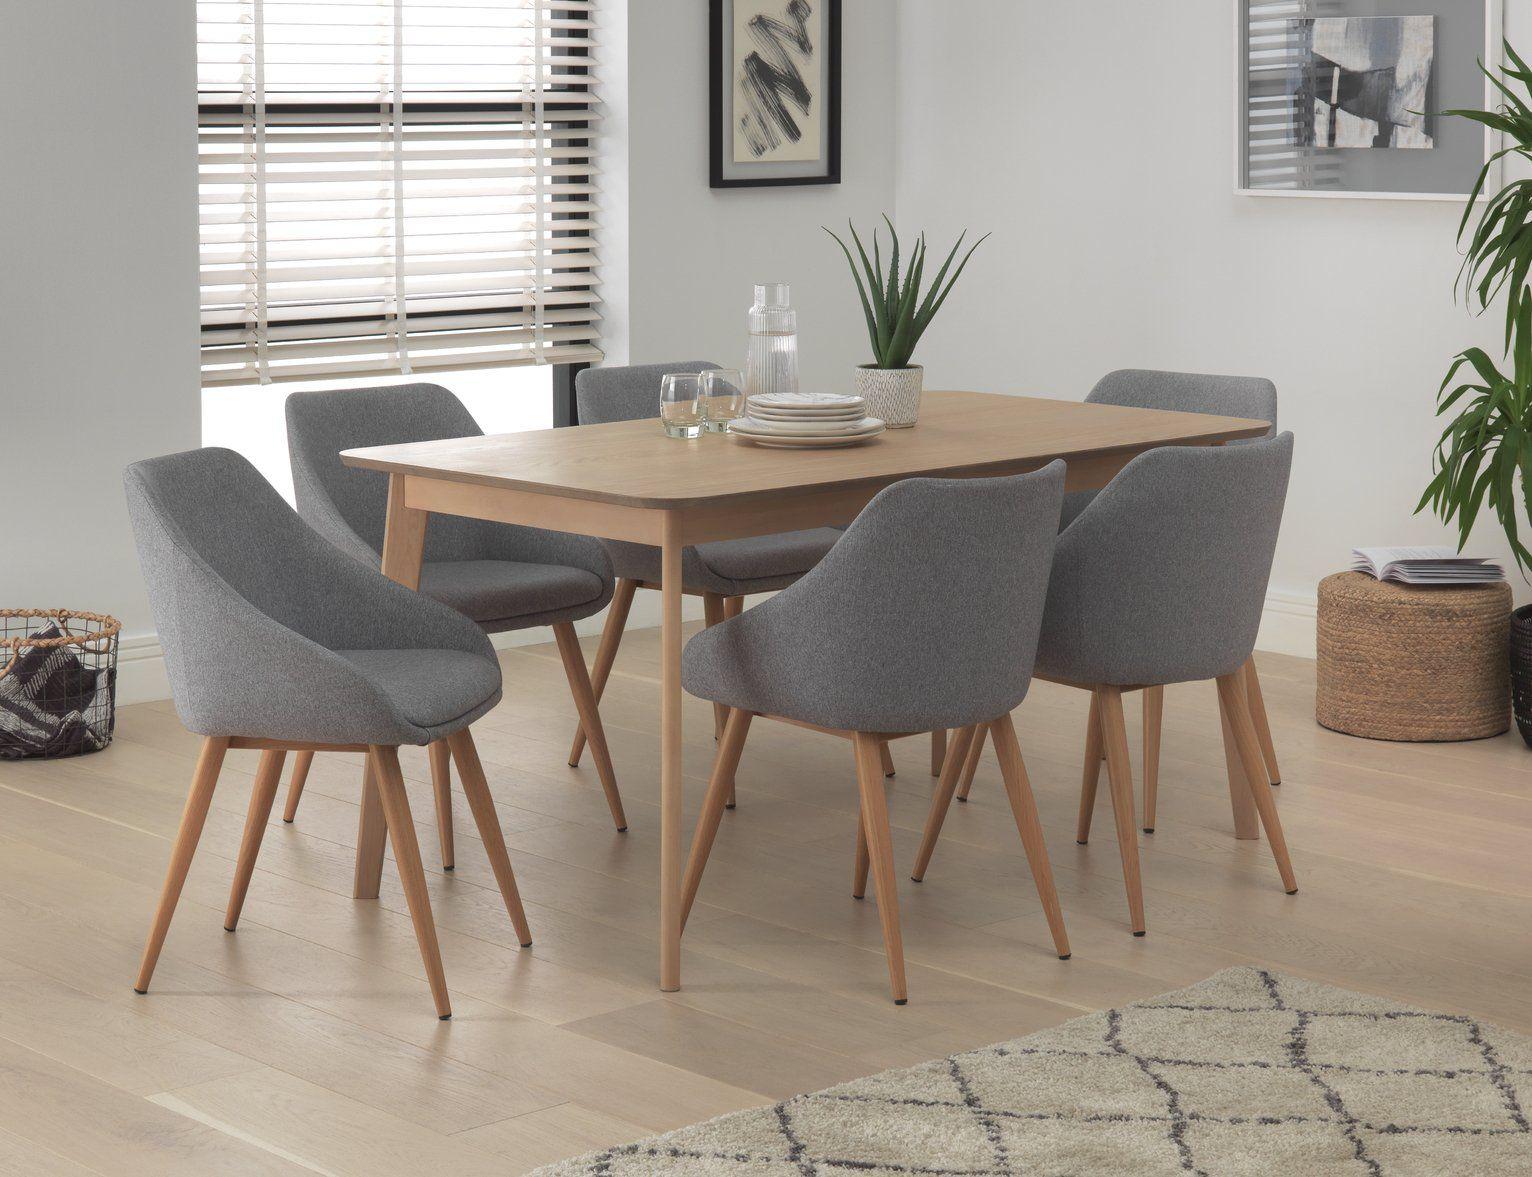 Buy Habitat Skandi Oak Veneer Dining Table & 9 Grey Chairs ...